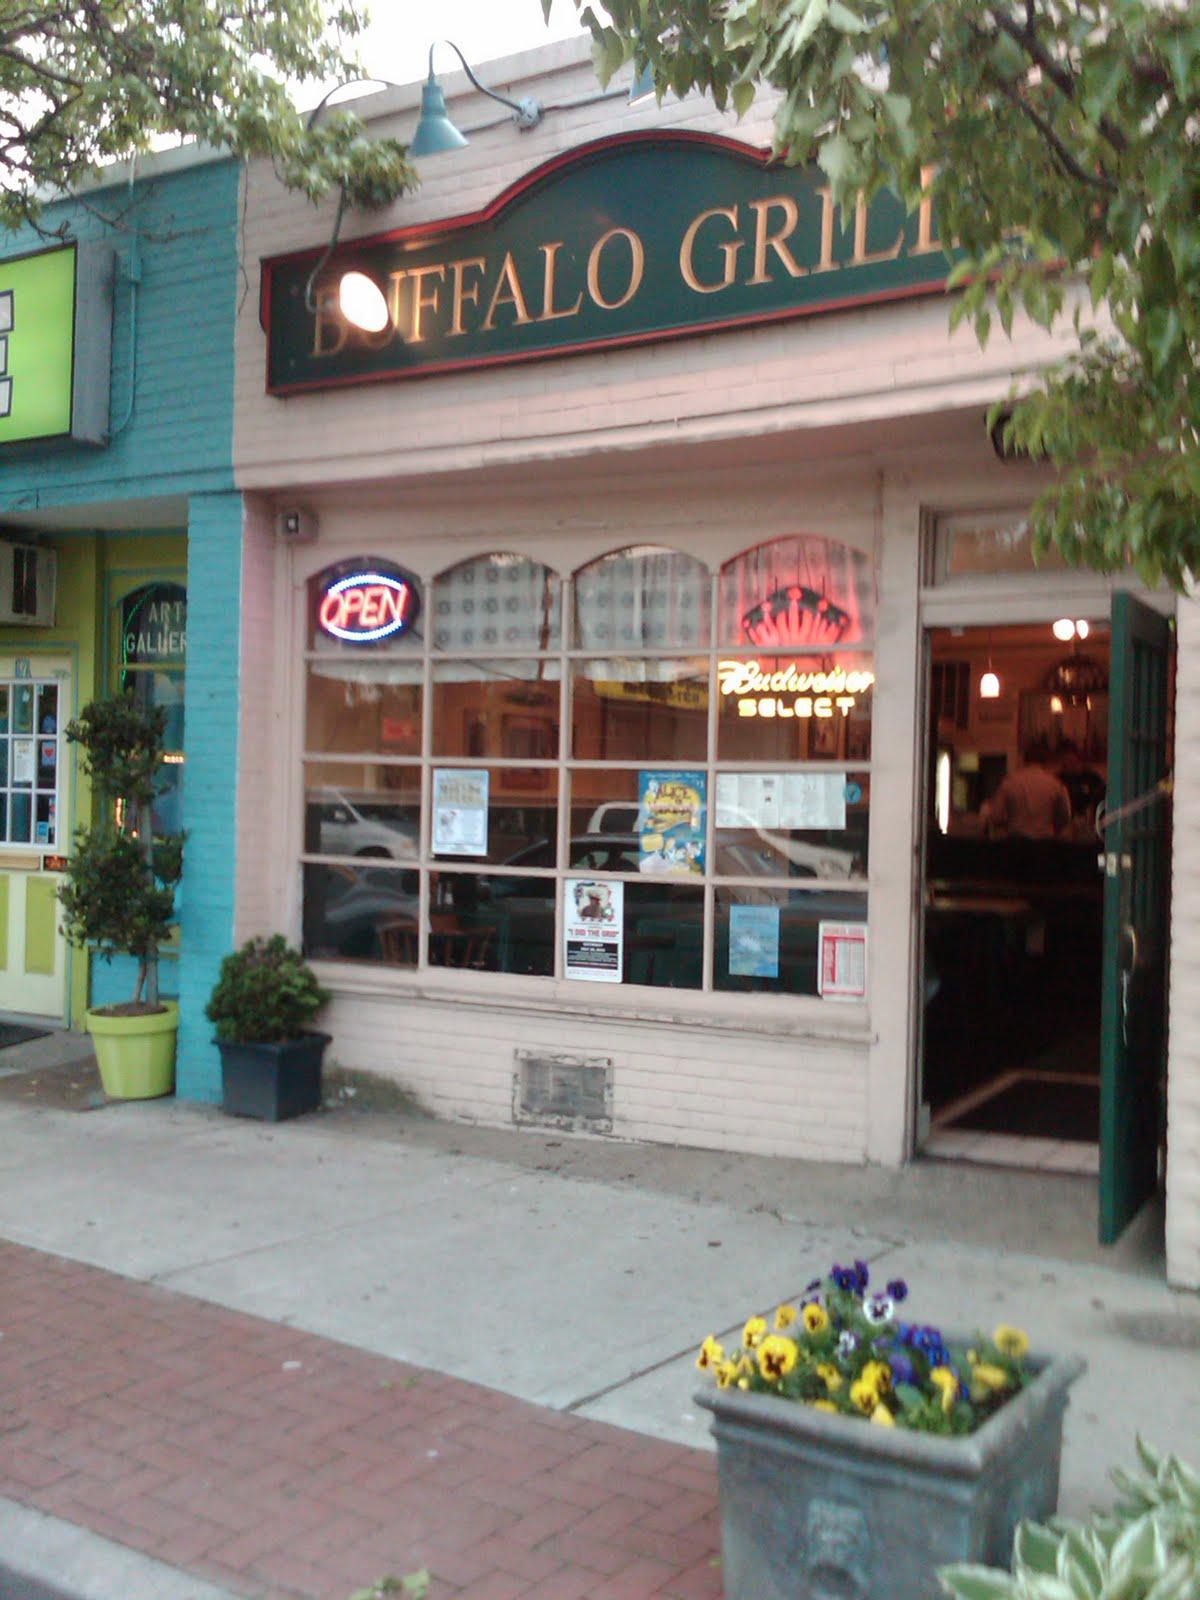 The wingmen lisa 39 s buffalo grille - Buffalo grille greenlawn menu ...